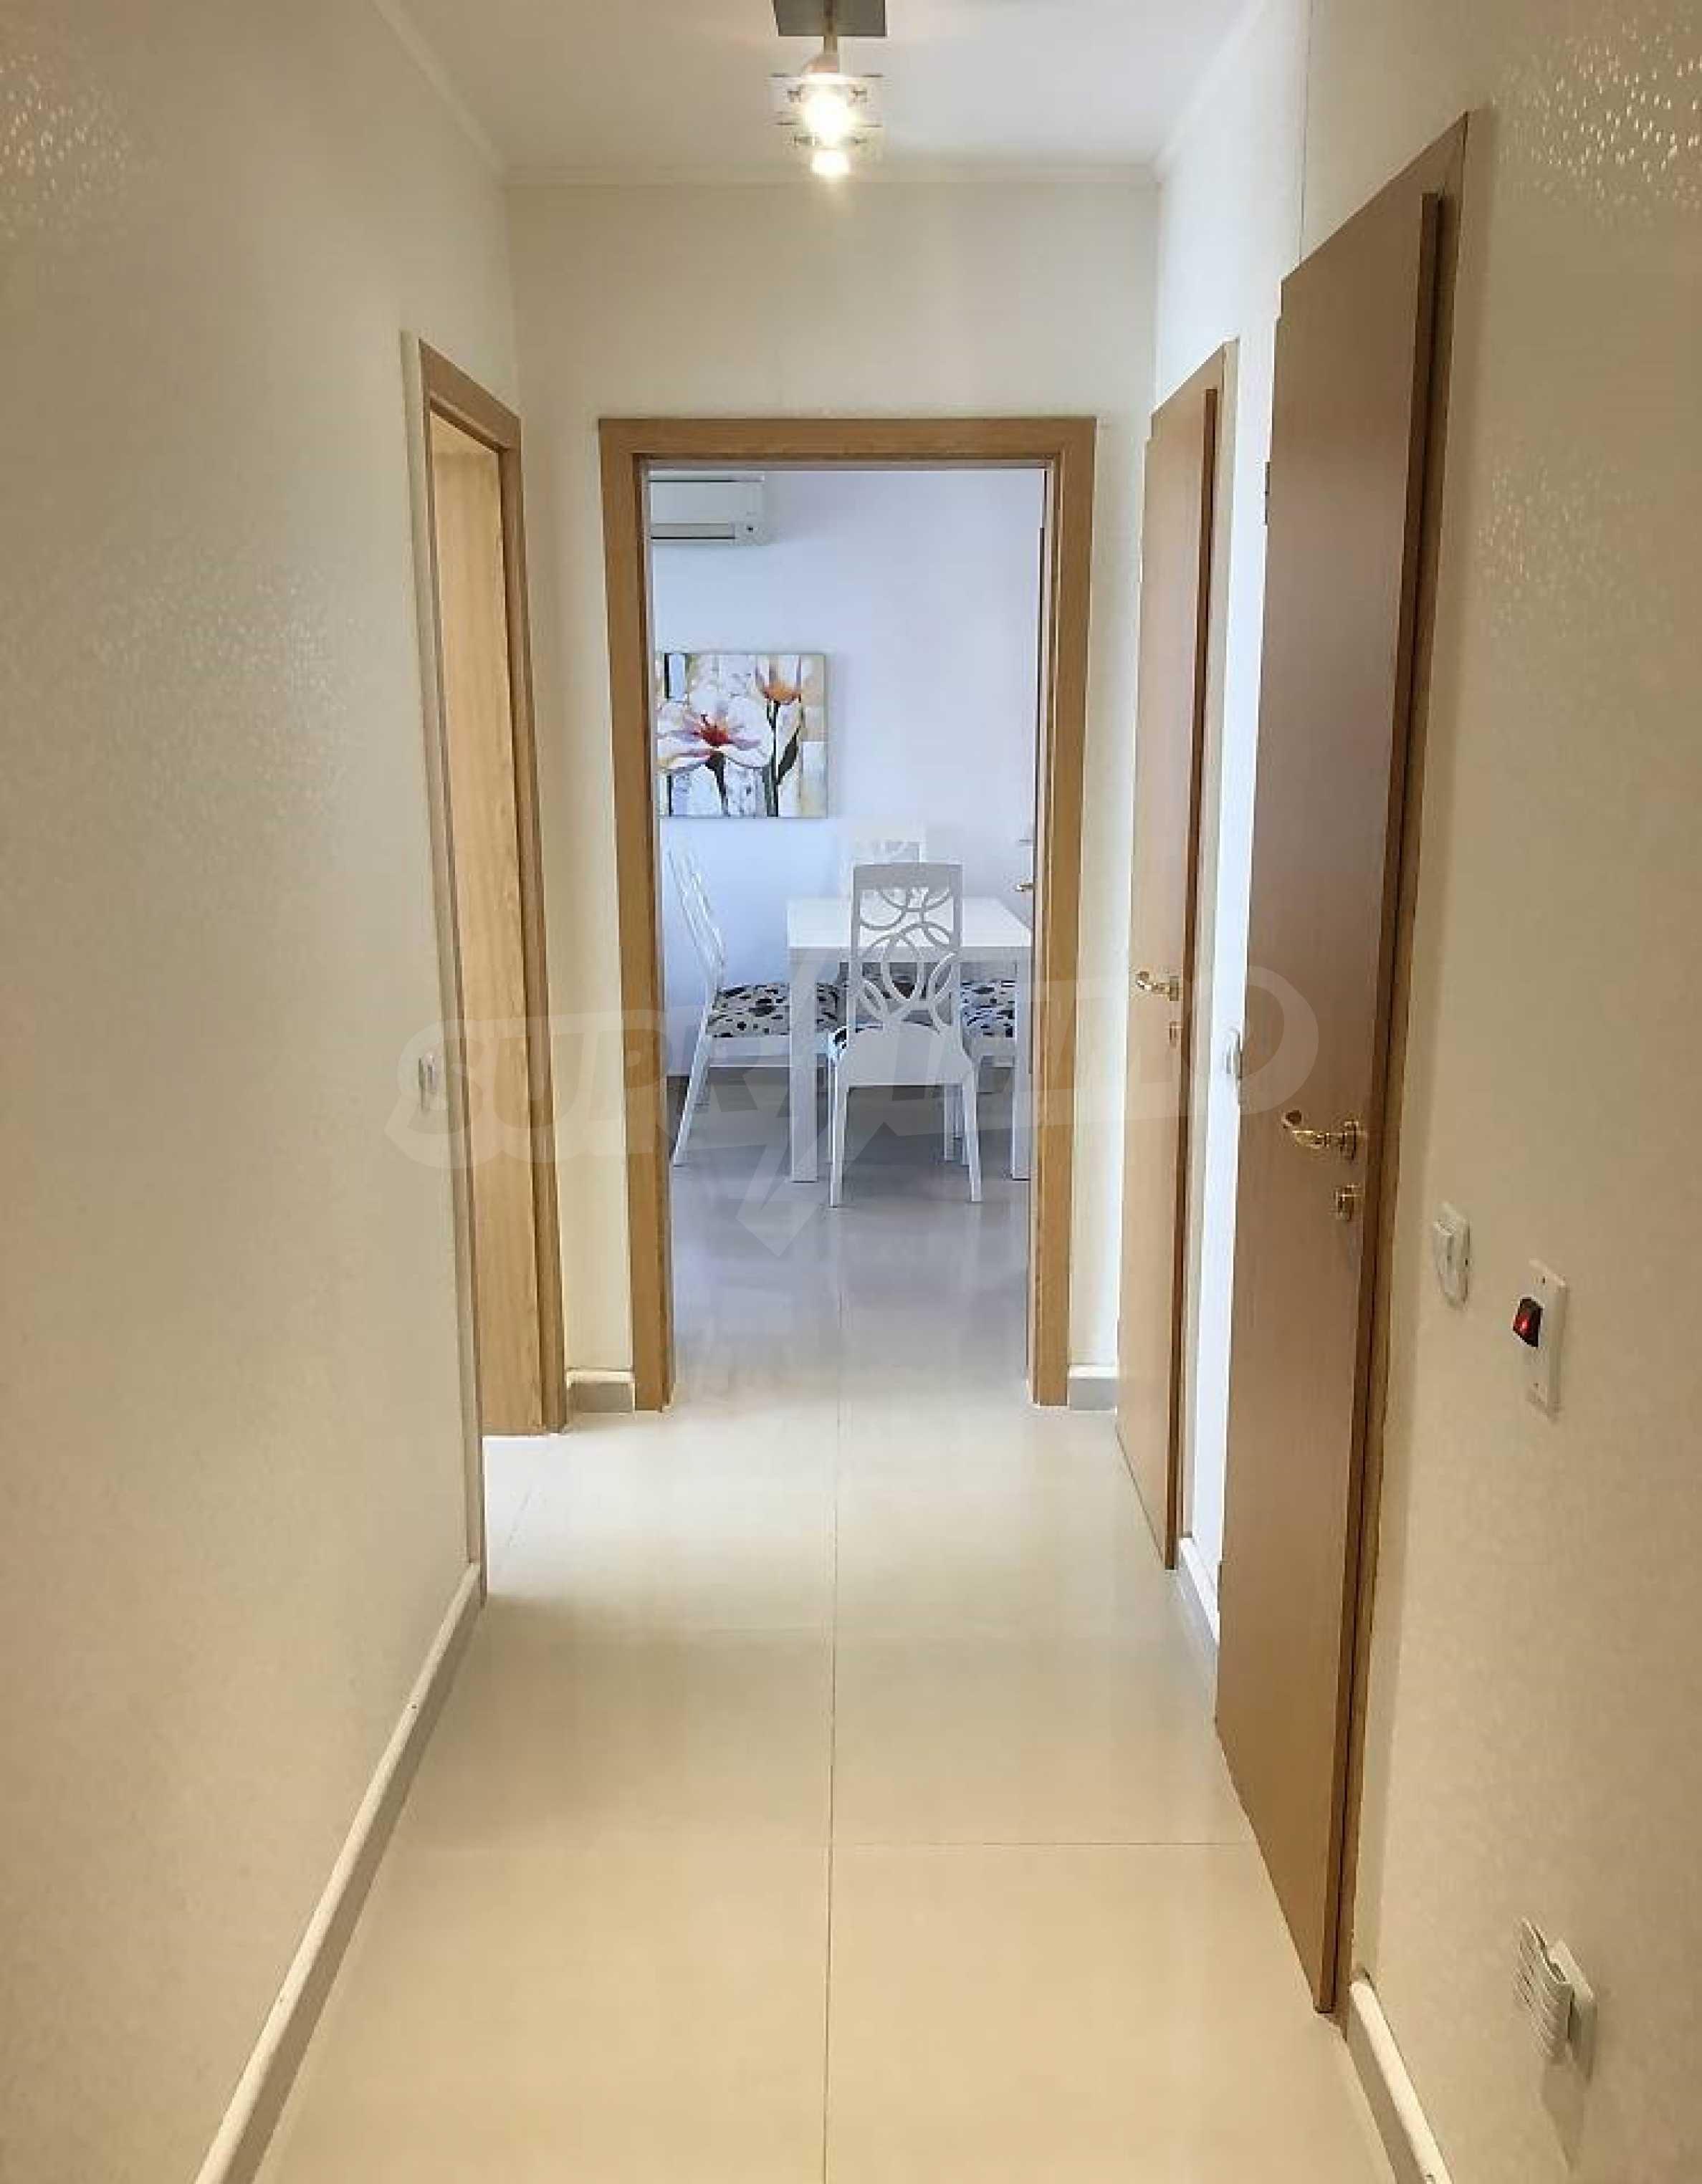 1-bedroom apartment in Burgas 11